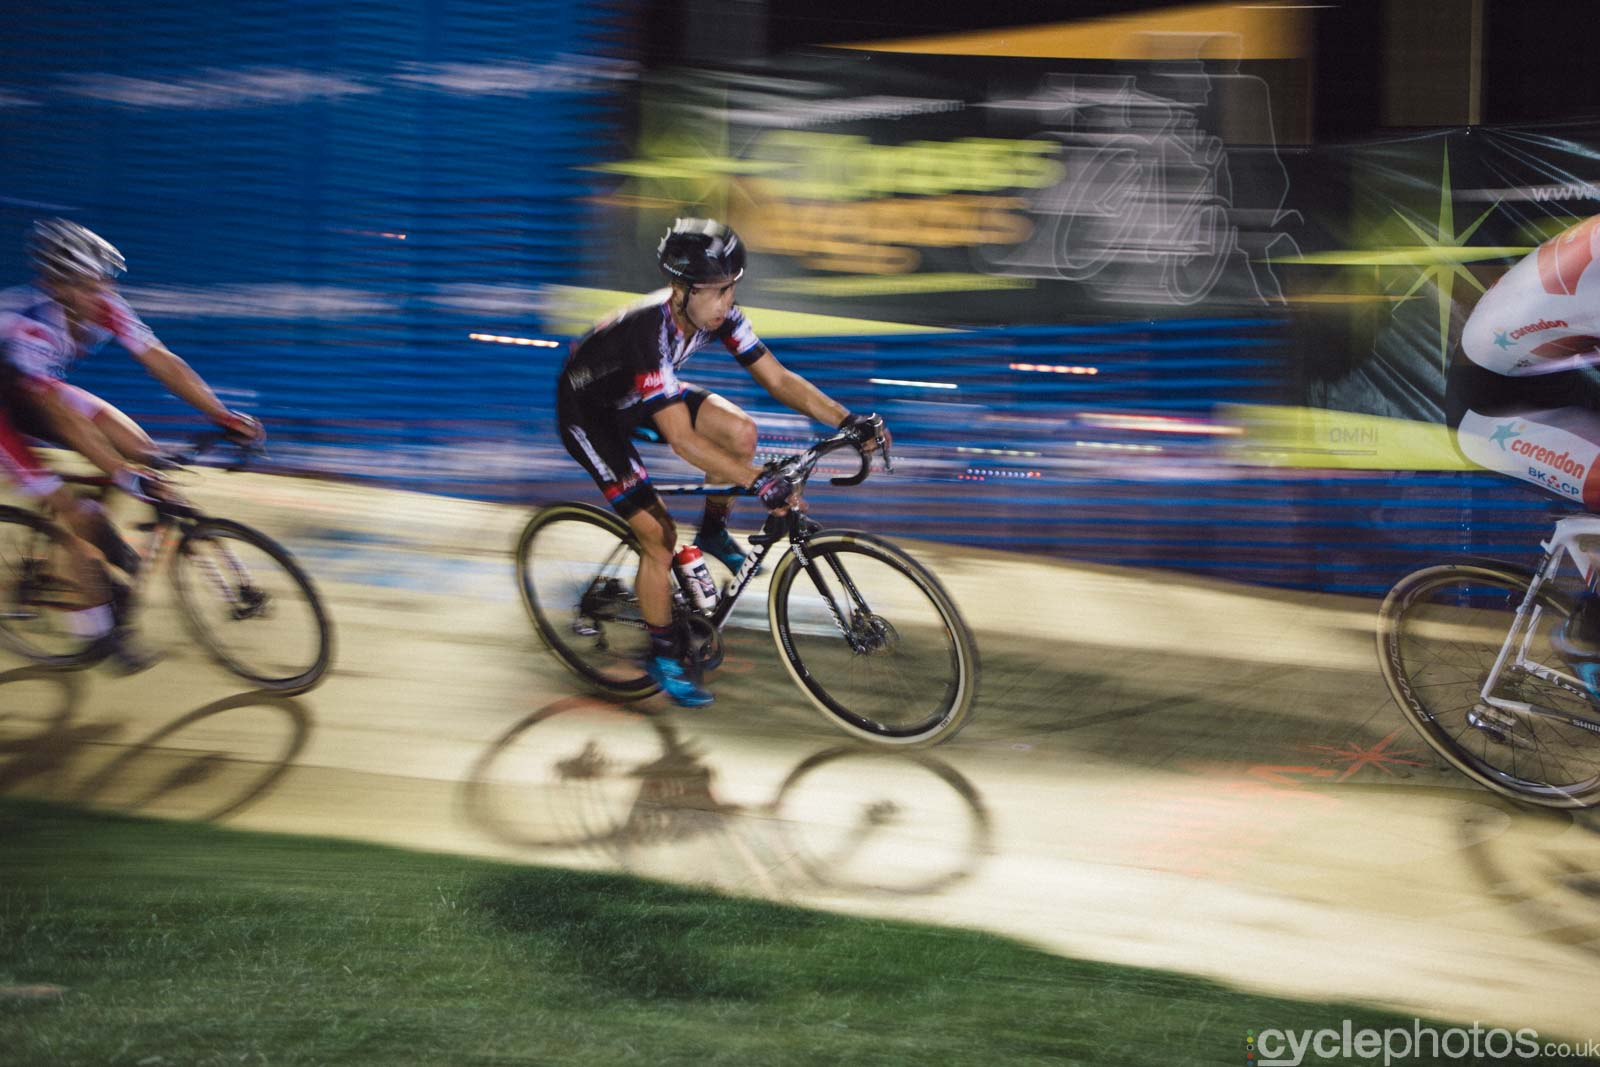 Lars van der Haar during Crossvegas, the first round of the 2015 UCI Cyclocross World race in Las Vegas, USA.